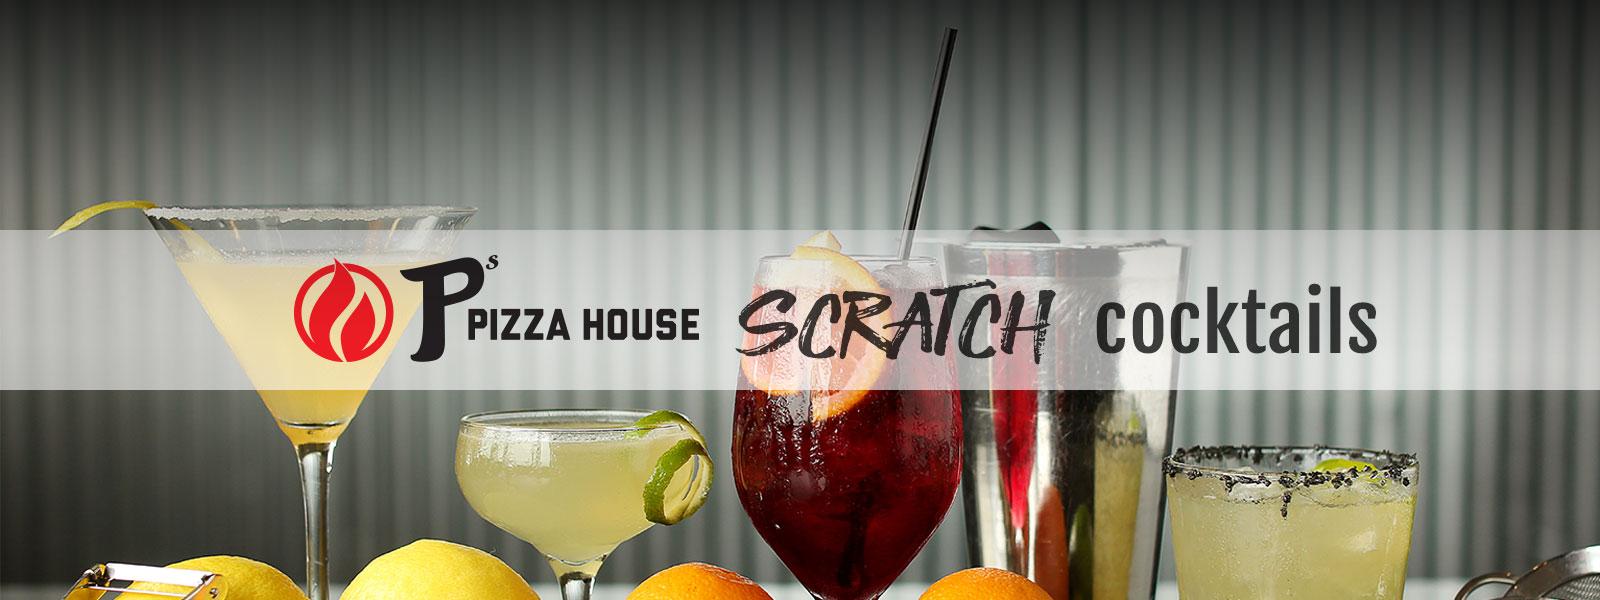 Scratch Cocktails | P's Pizza House | Le Mars, IA, Orange City, IA, and Dakota Dunes, SD